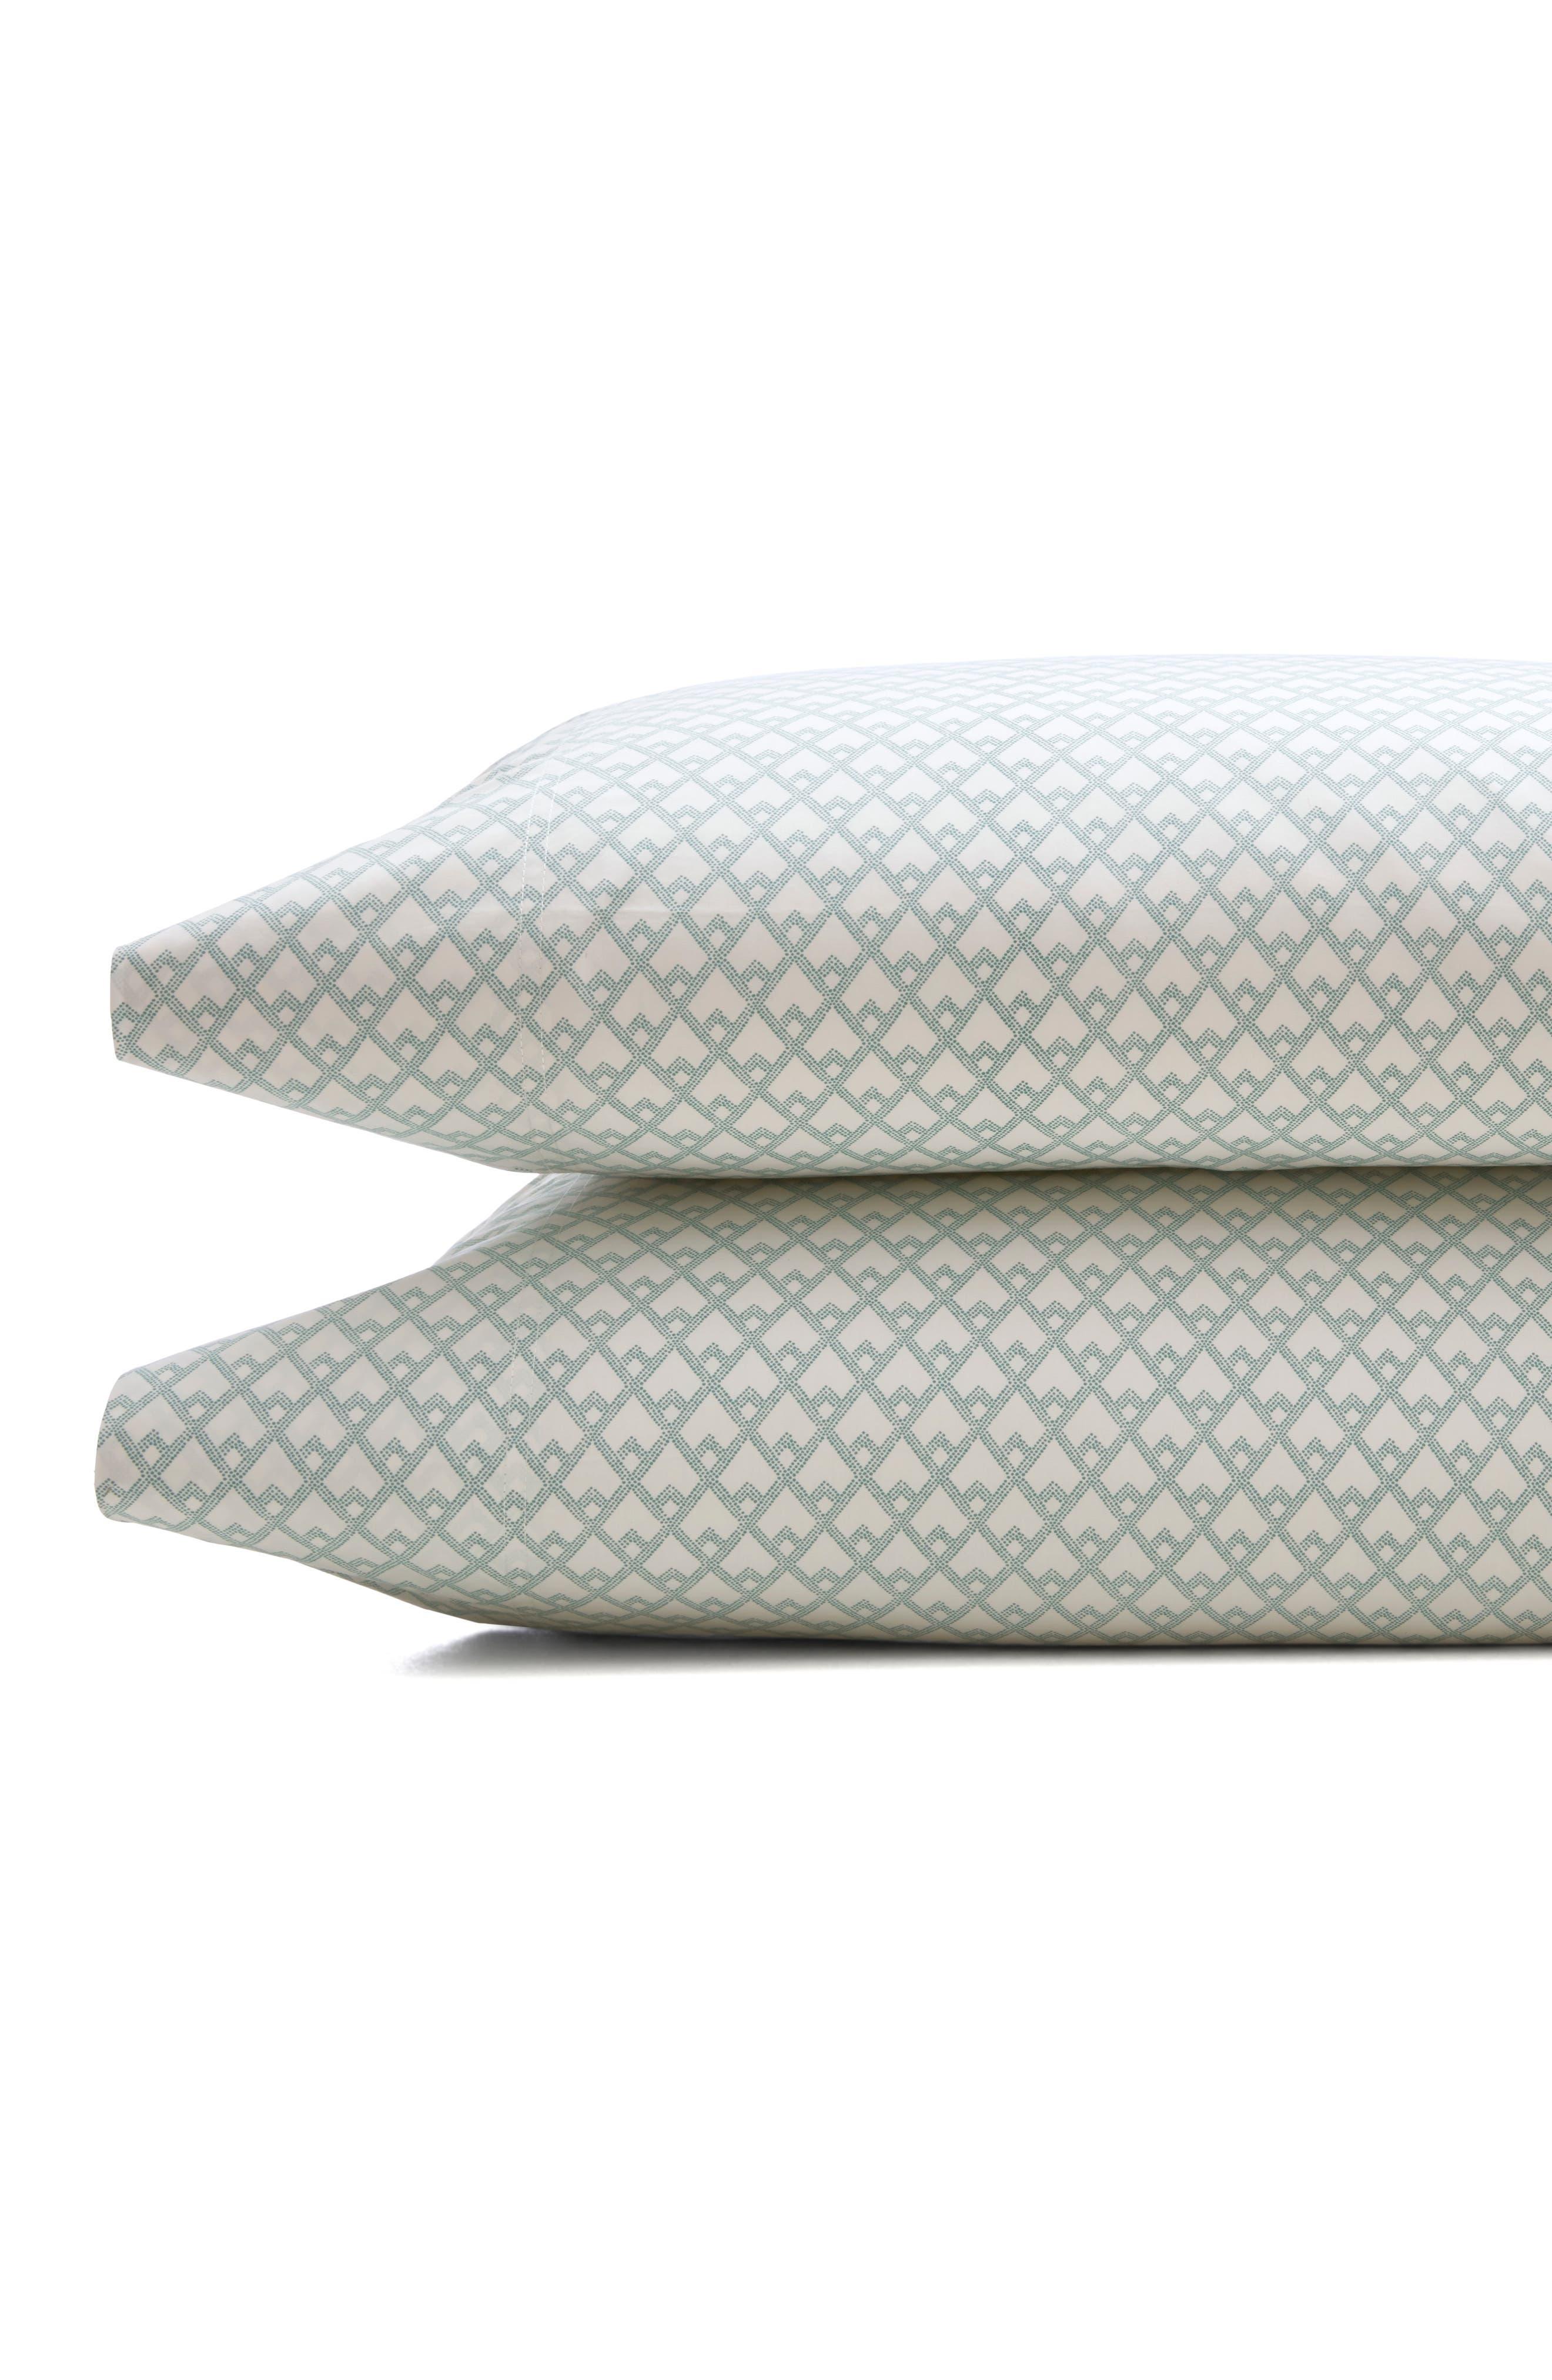 DwellStudio Masala Set of 2 Pillowcases